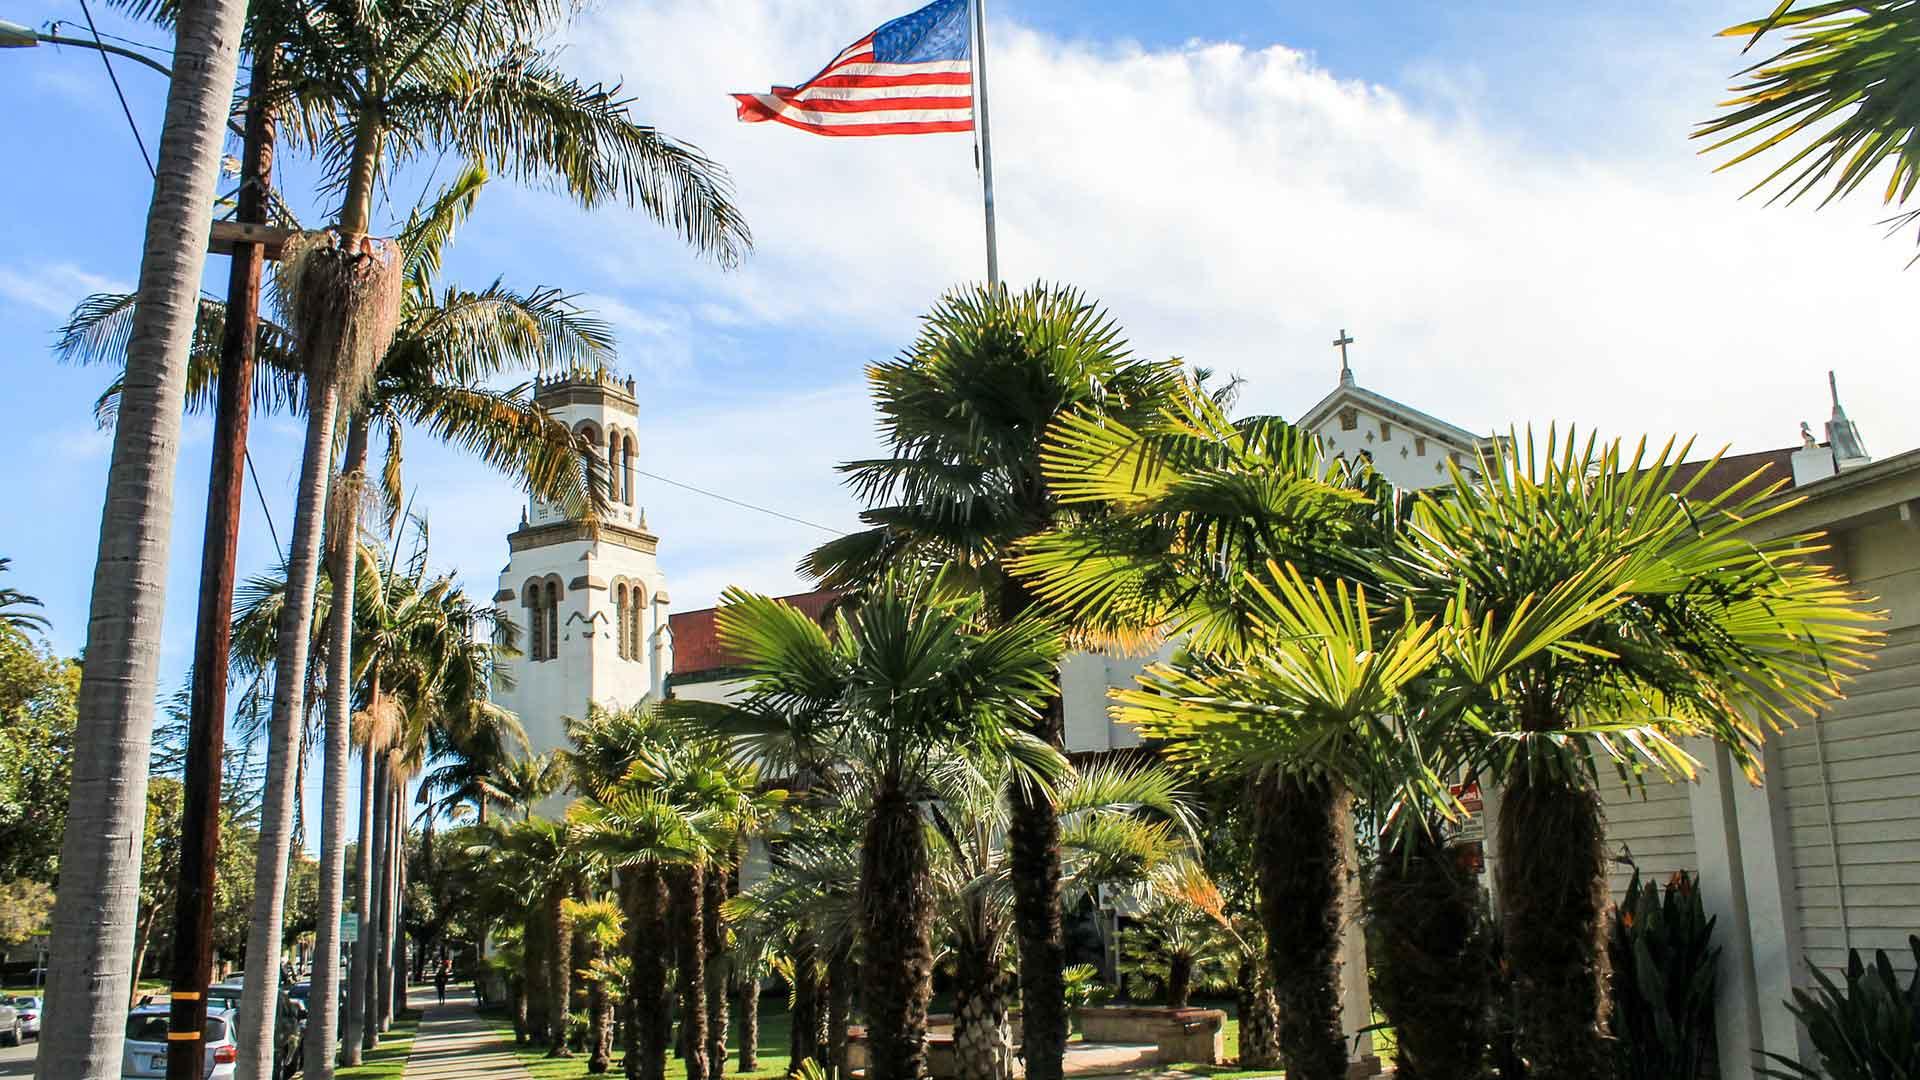 Guide-to-Santa-Barbara-on-TheSunrisePost